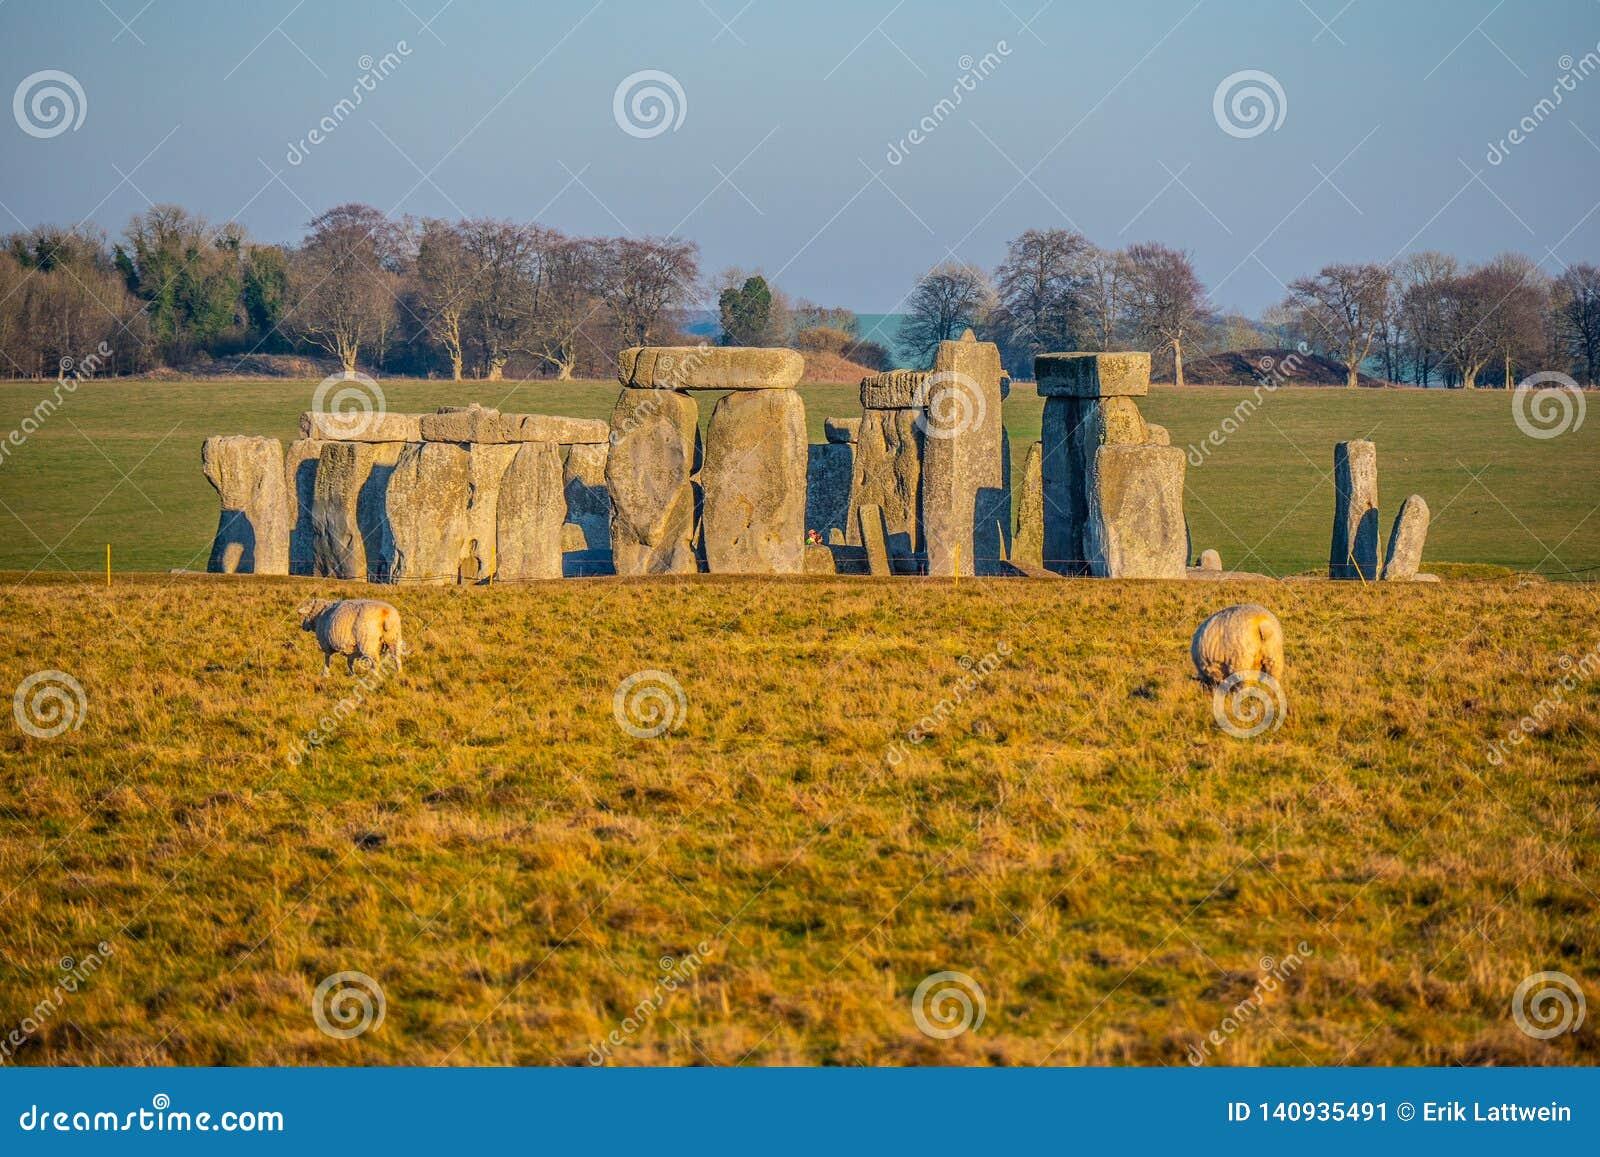 Stonehenge in England is a popular landmark